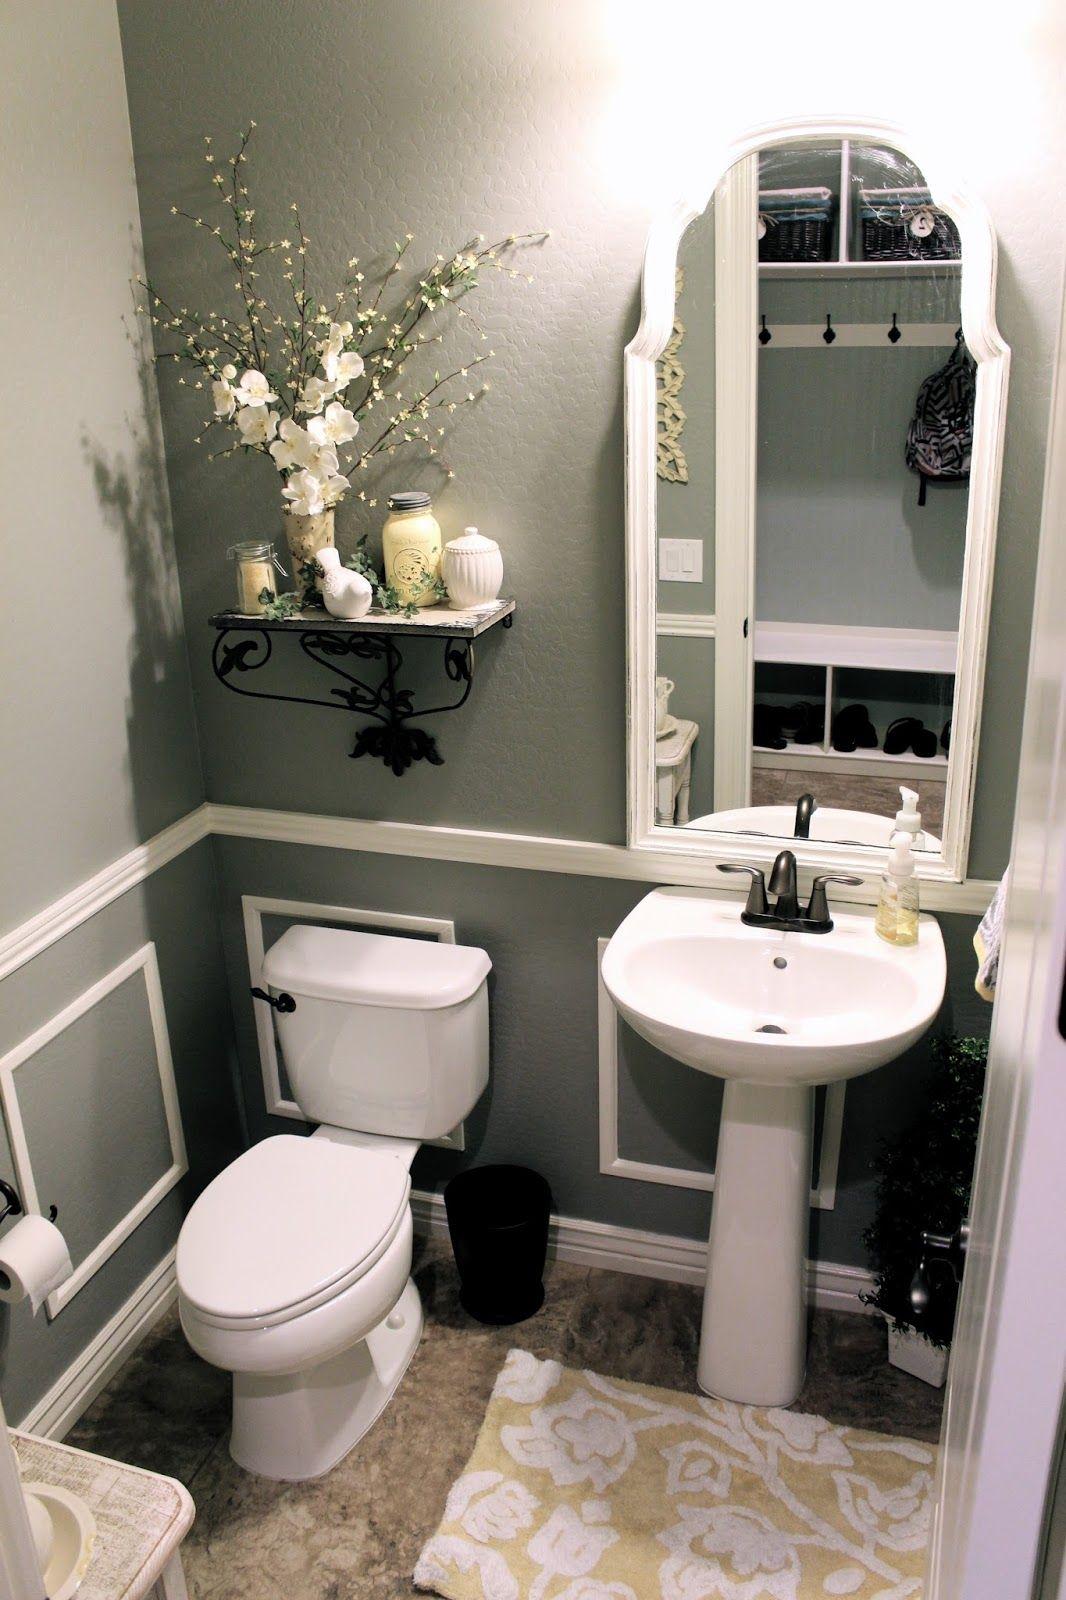 Little Bit Of Paint Thrifty Thursday Bathroom Reveal for The